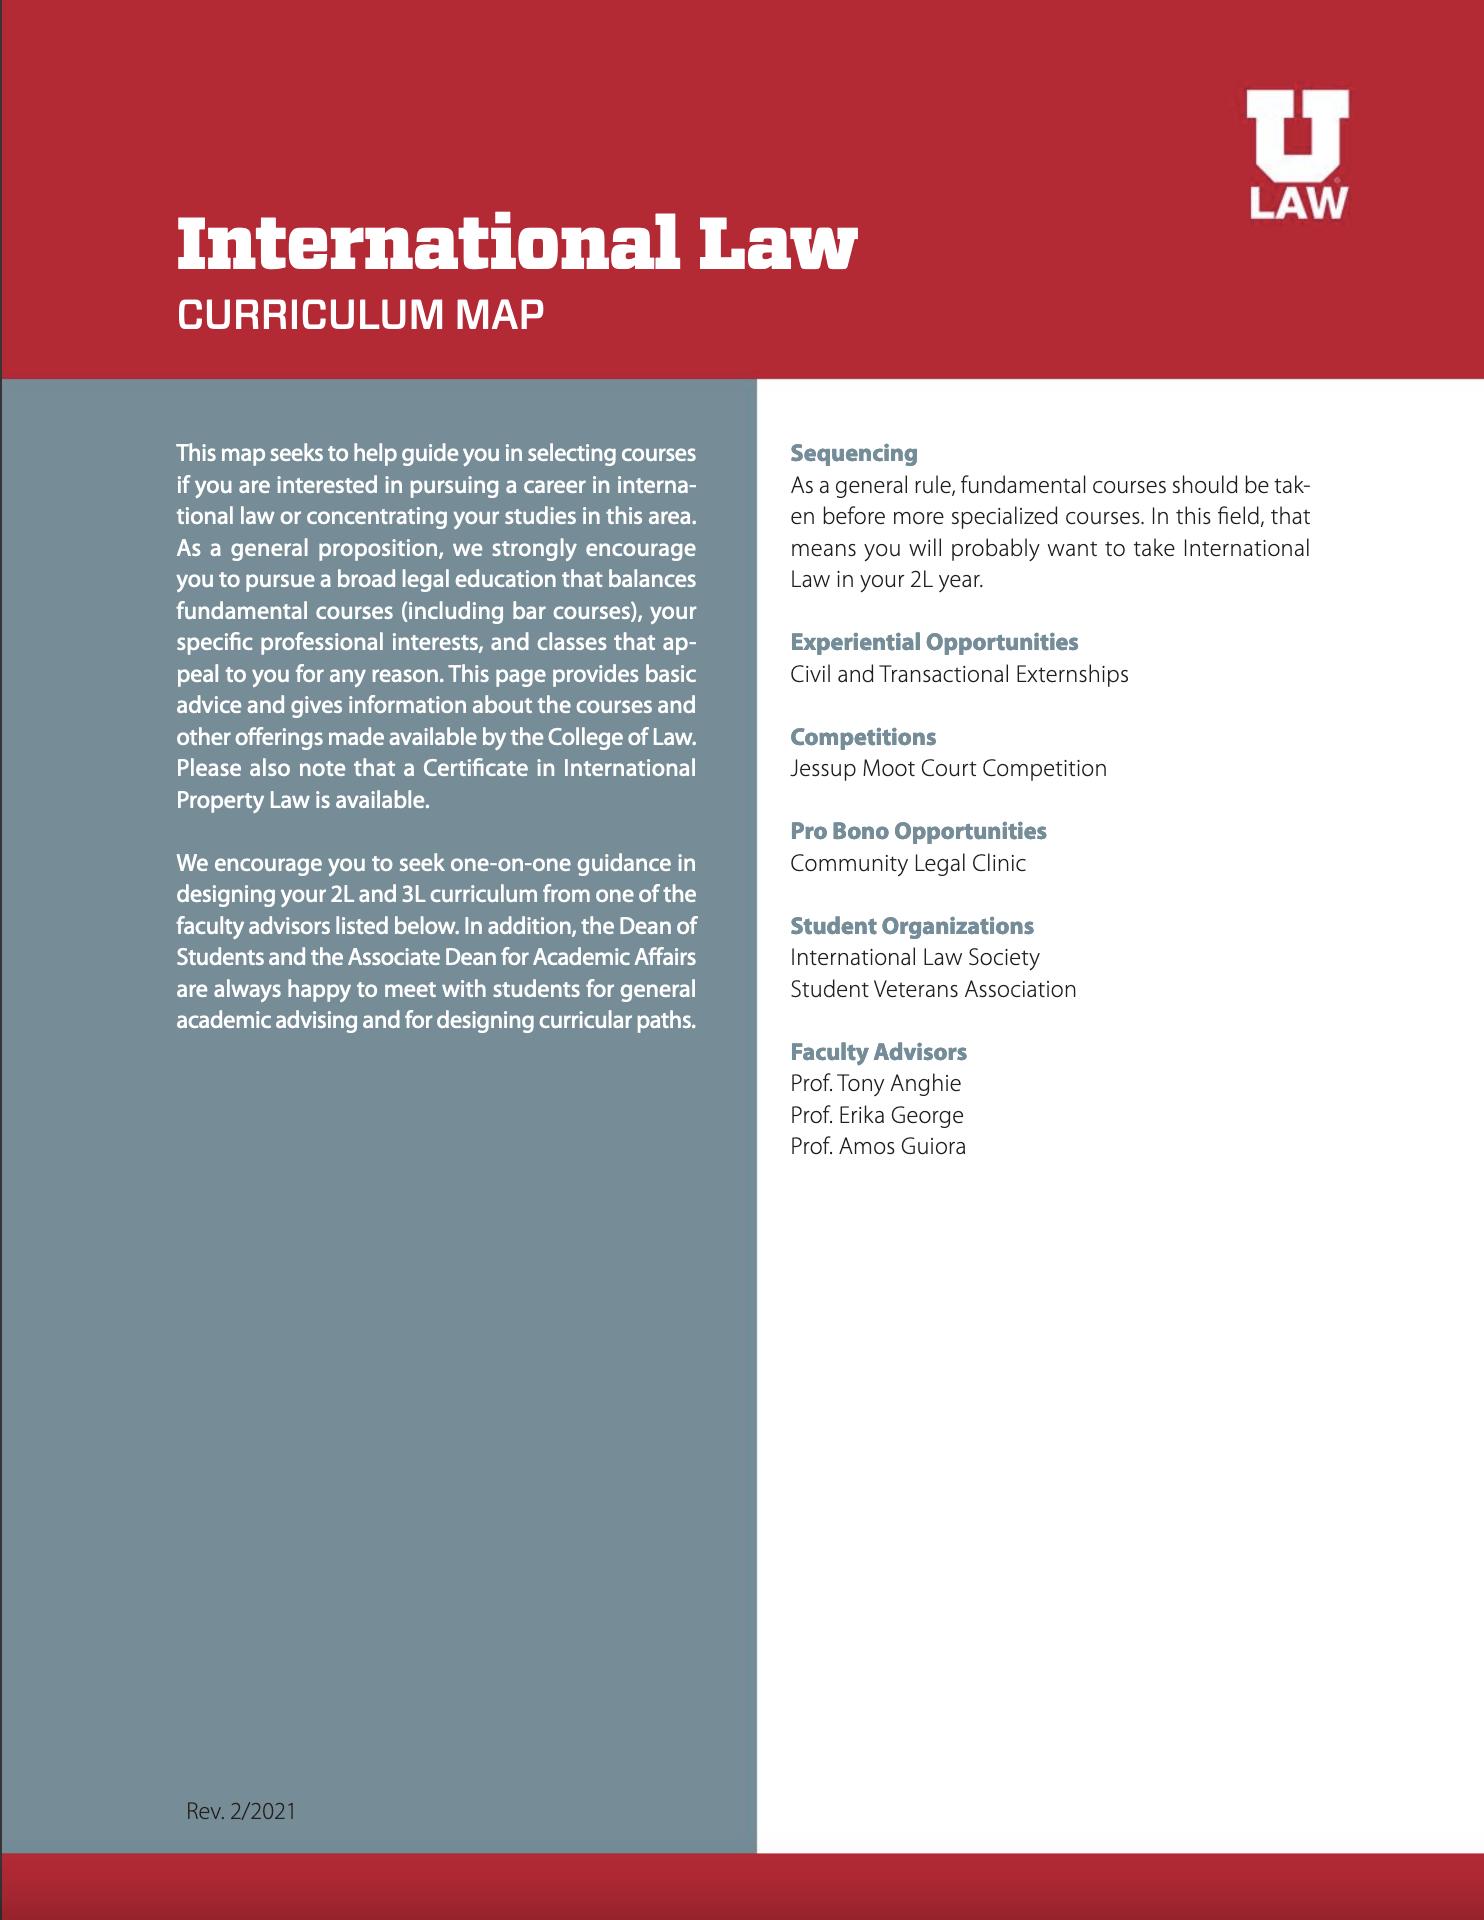 International Law Curriculum Map